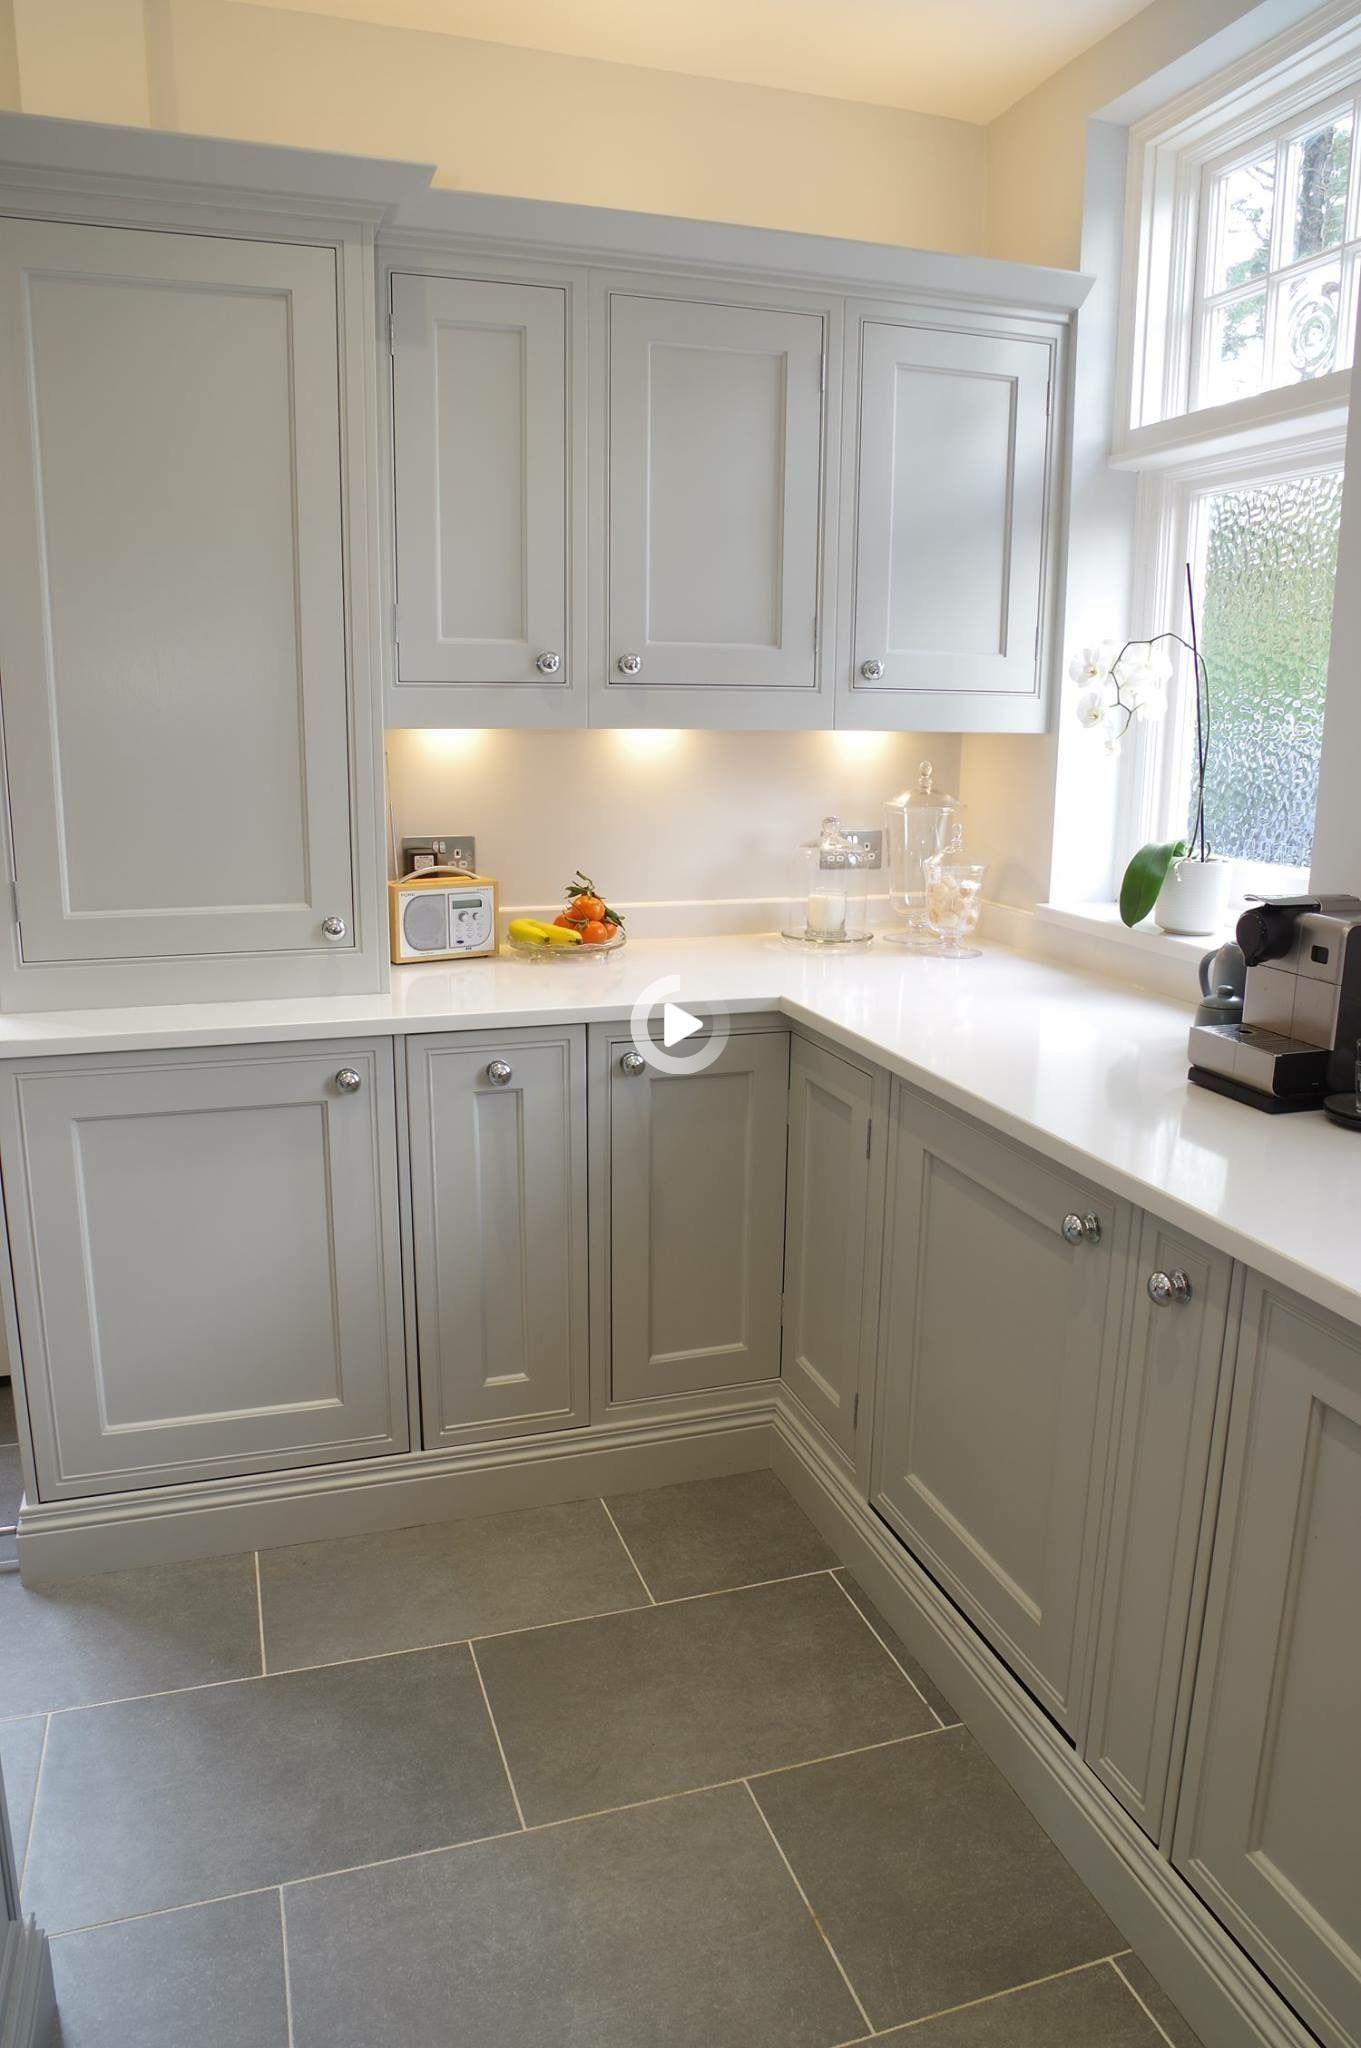 Edgecliff Appliance Pull Natural Brass In 2021 Kitchen Renovation Kitchen Design Small Home Decor Kitchen